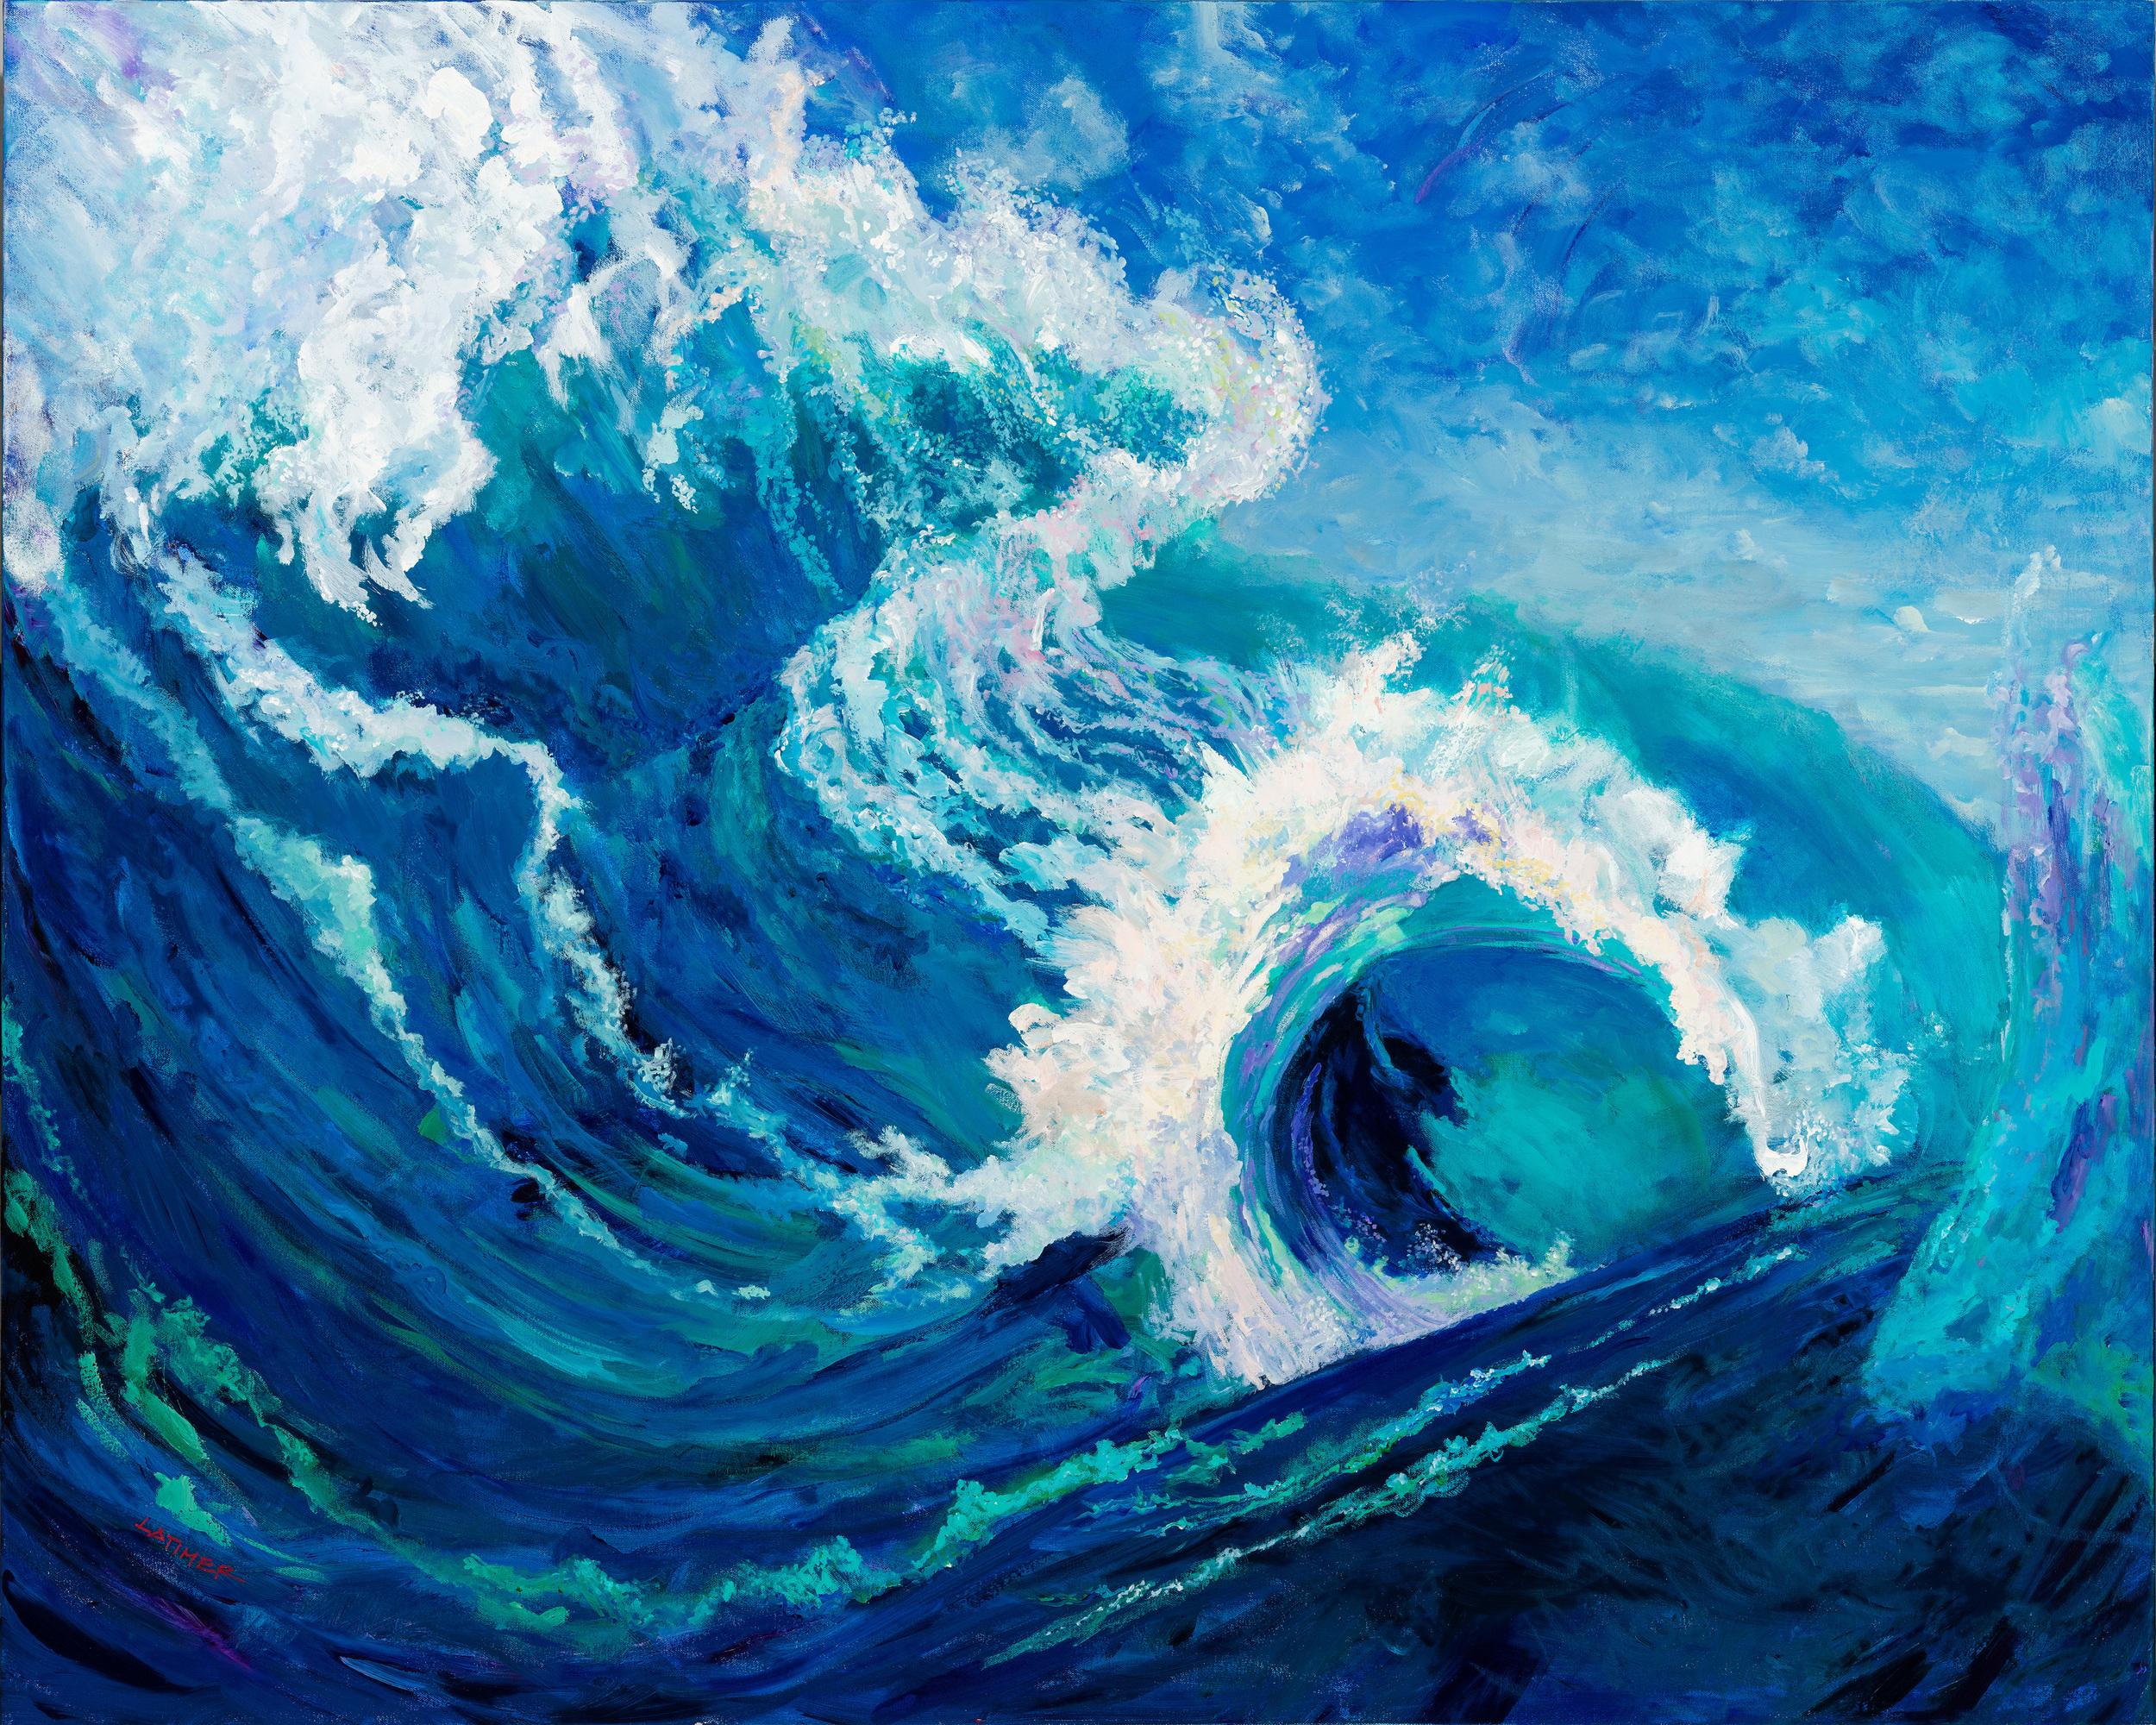 Tsunami of His Shalom by Latimer Bowen